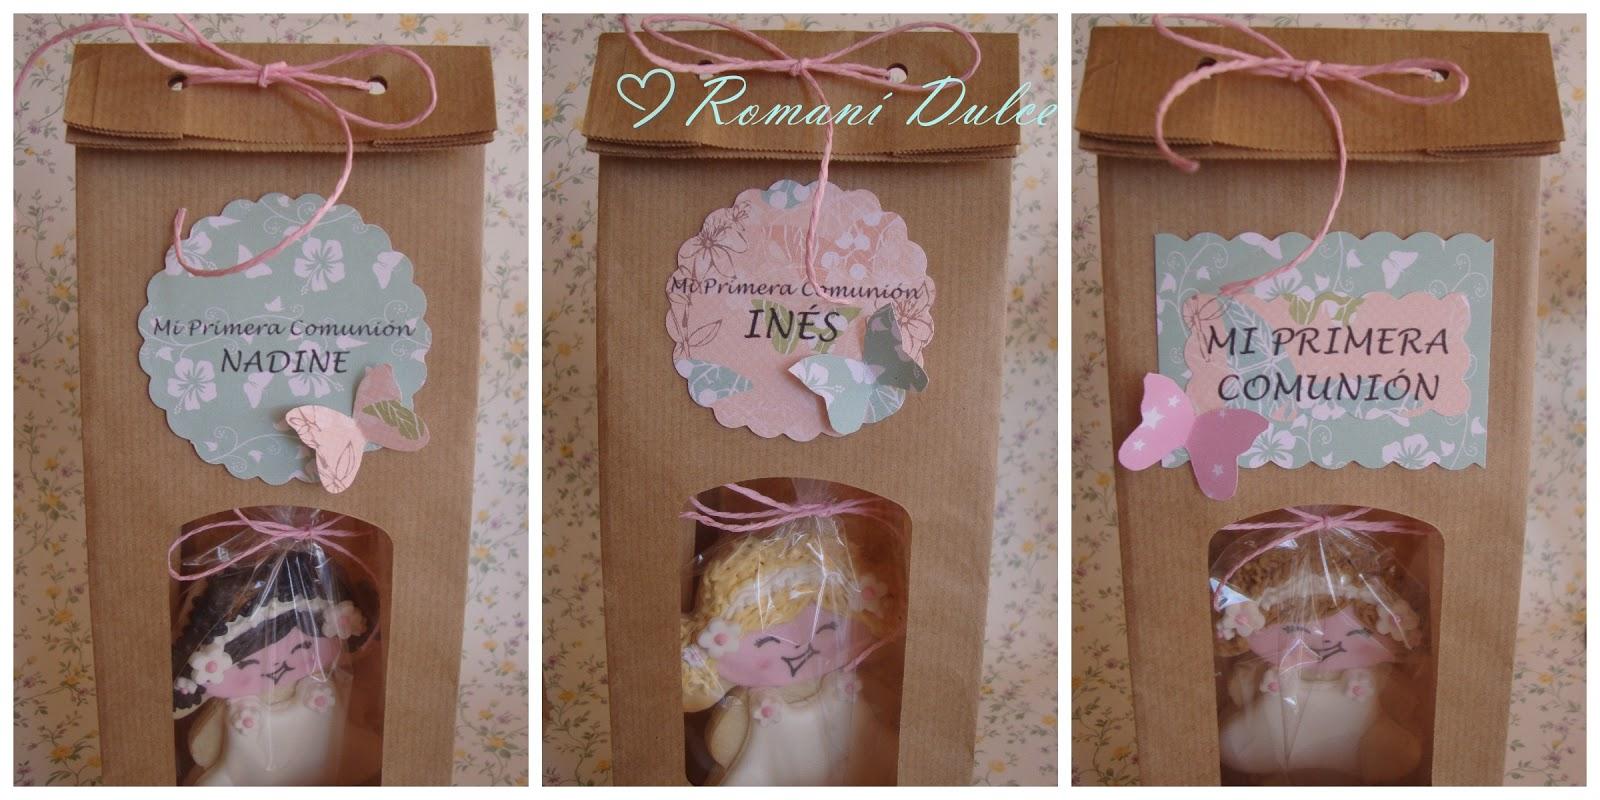 1000 images about bolsas on pinterest - Ideas para decorar ...